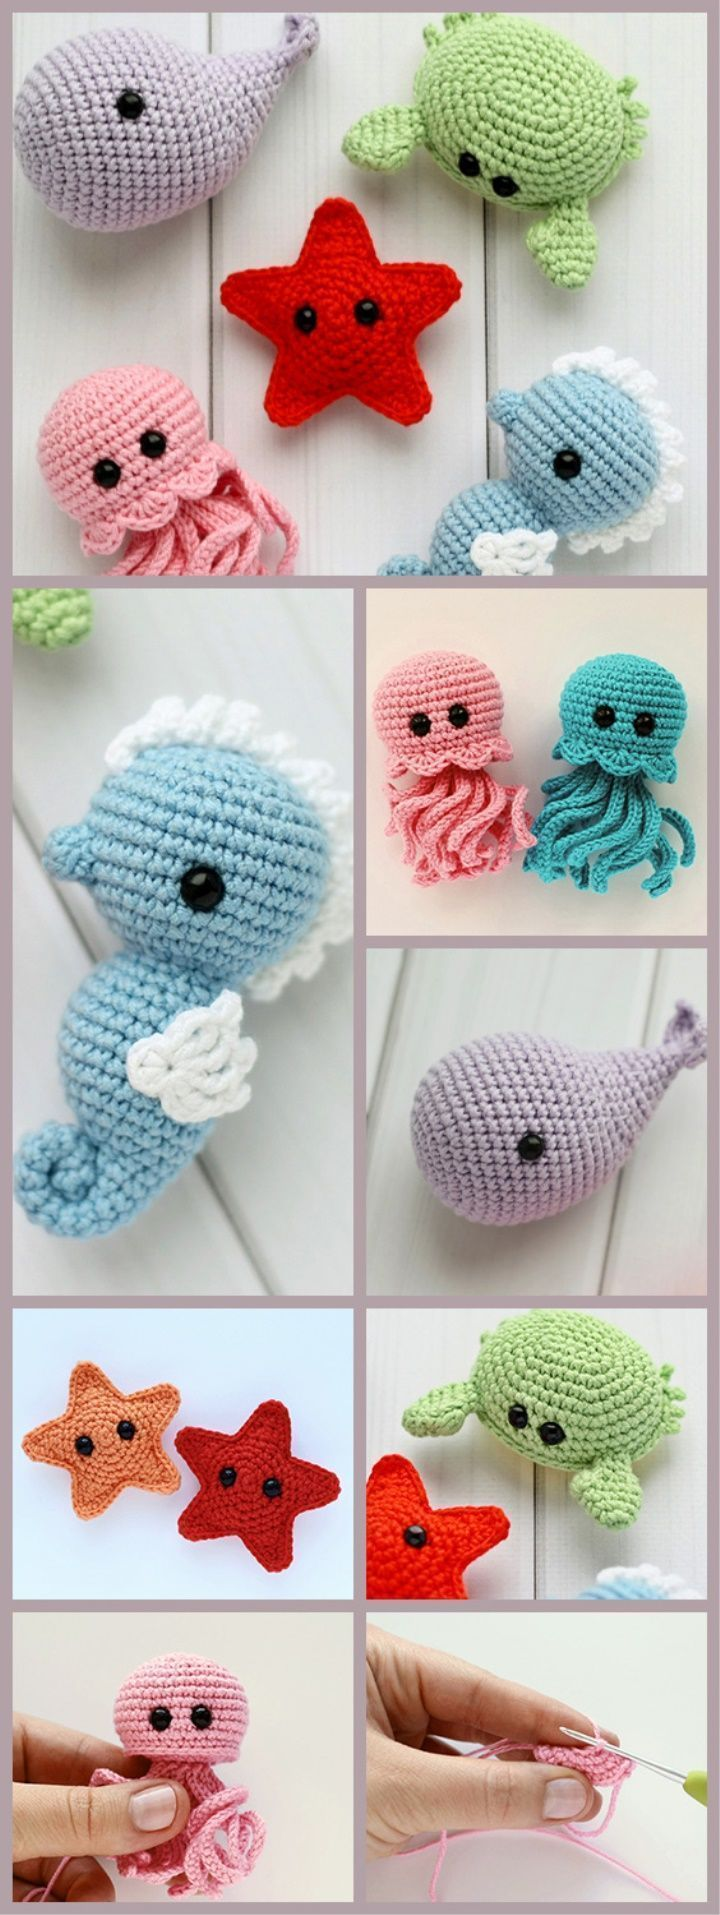 Crochet Patterns Step-by-Step Crochet Toy #amigurumi #crochettoys #handmade #tutorial #diy #croch…